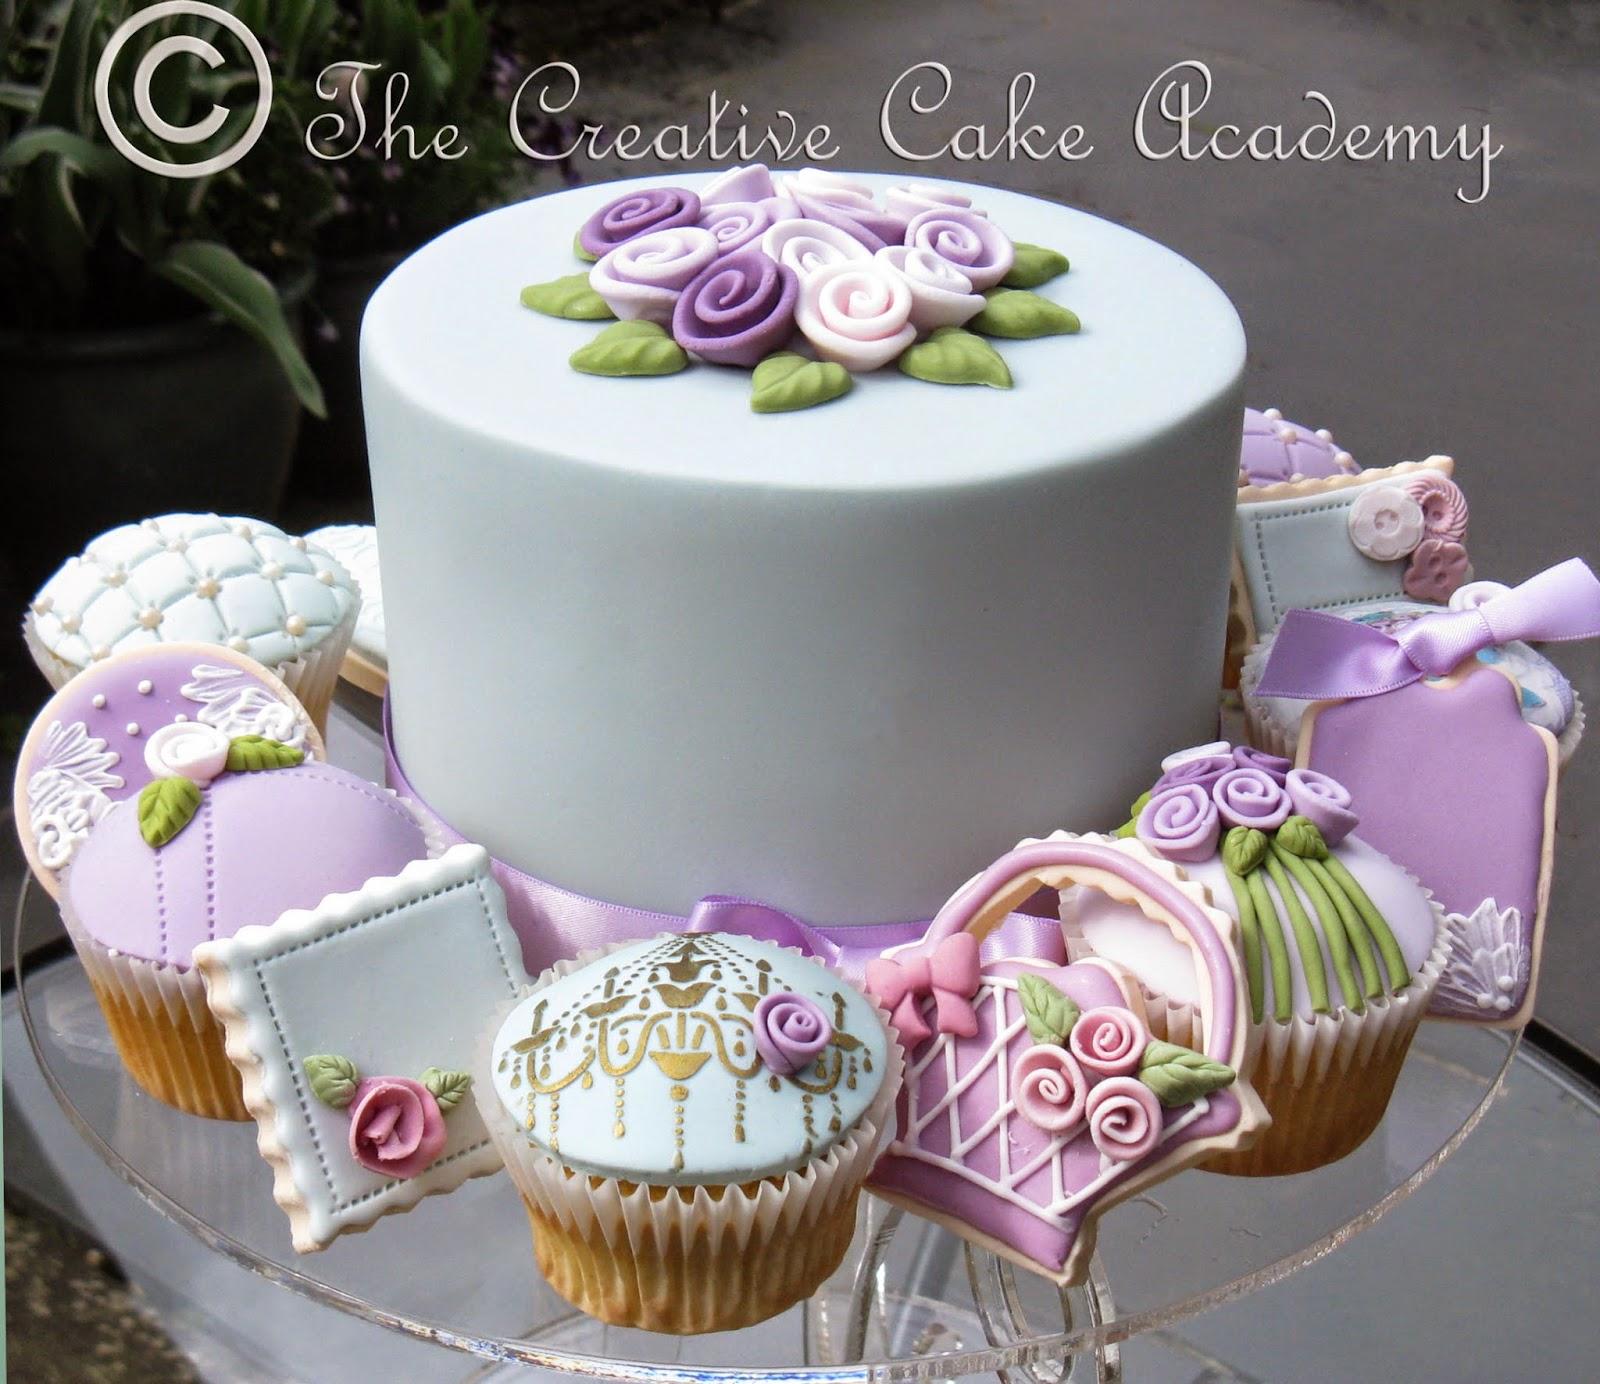 Wedding Cake Classes: The Creative Cake Academy